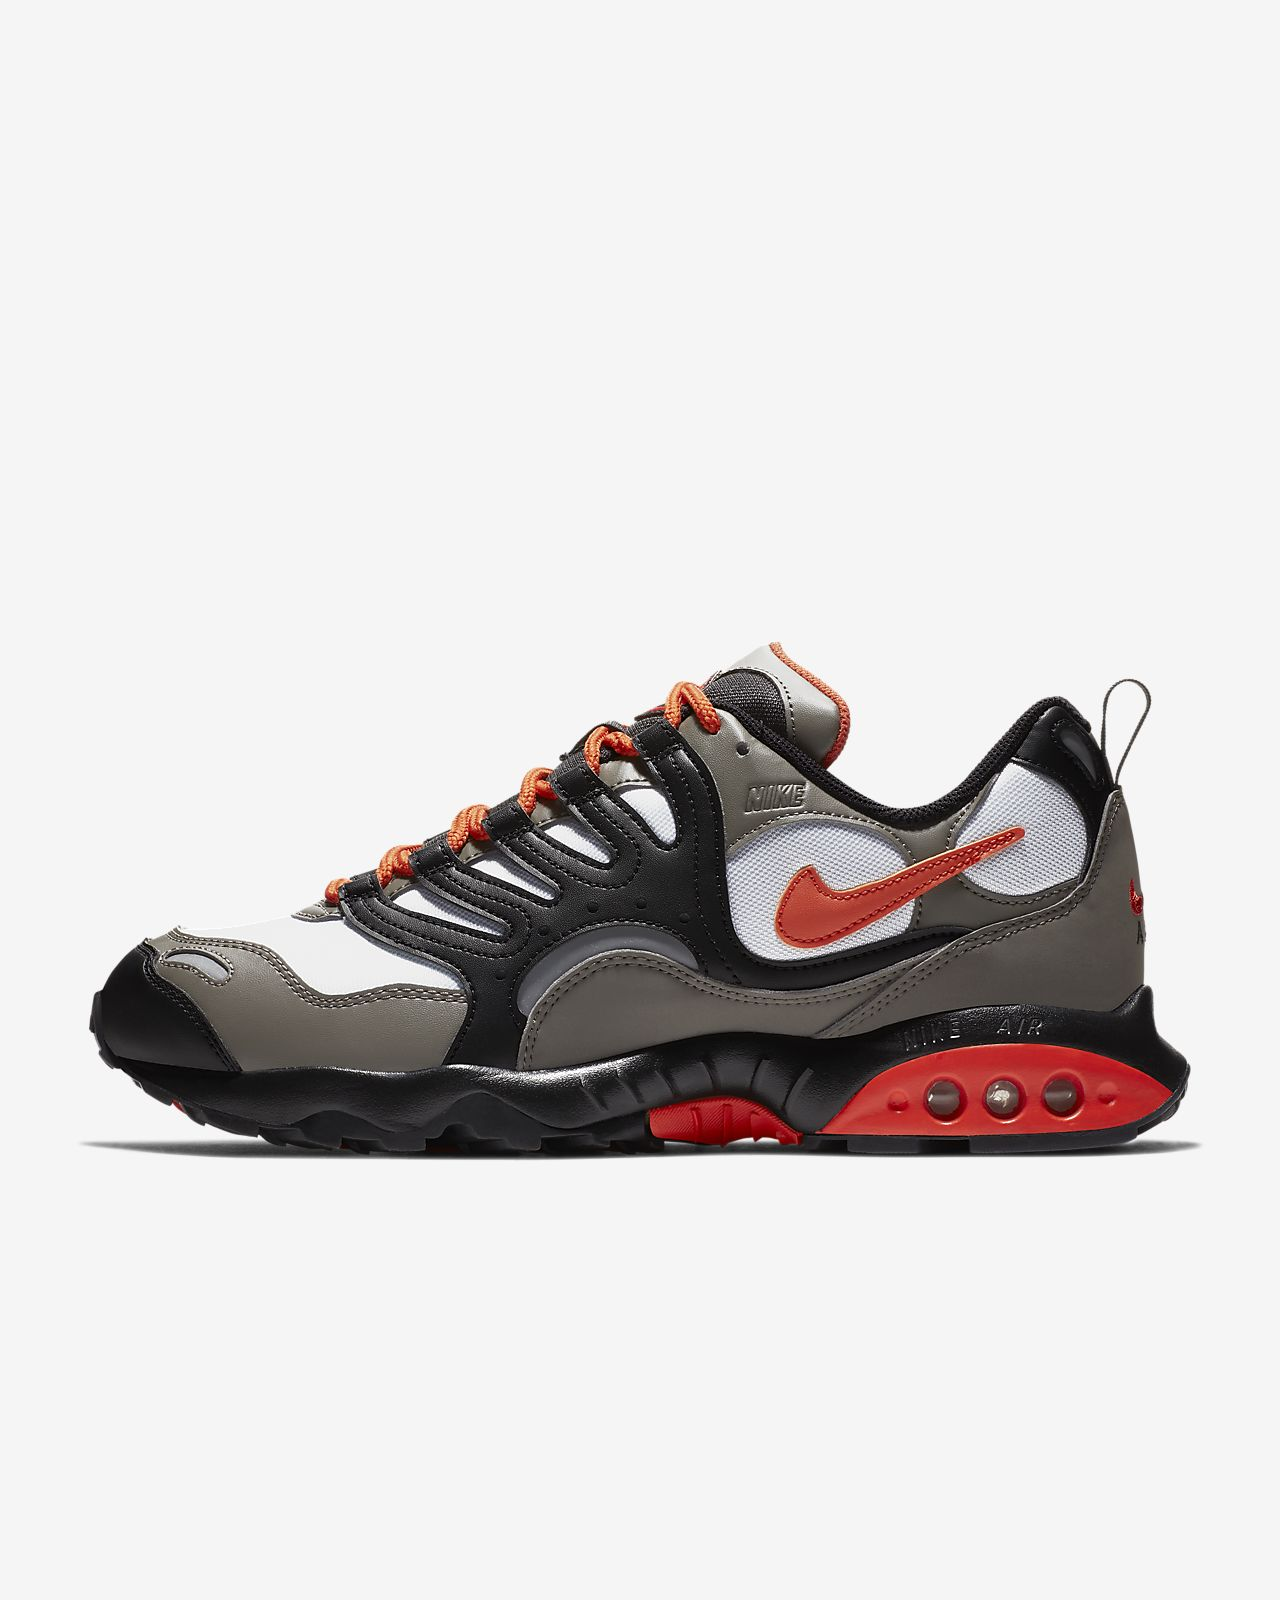 super popular 09c84 c8269 ... Nike Air Terra Humara 18 Herenschoen